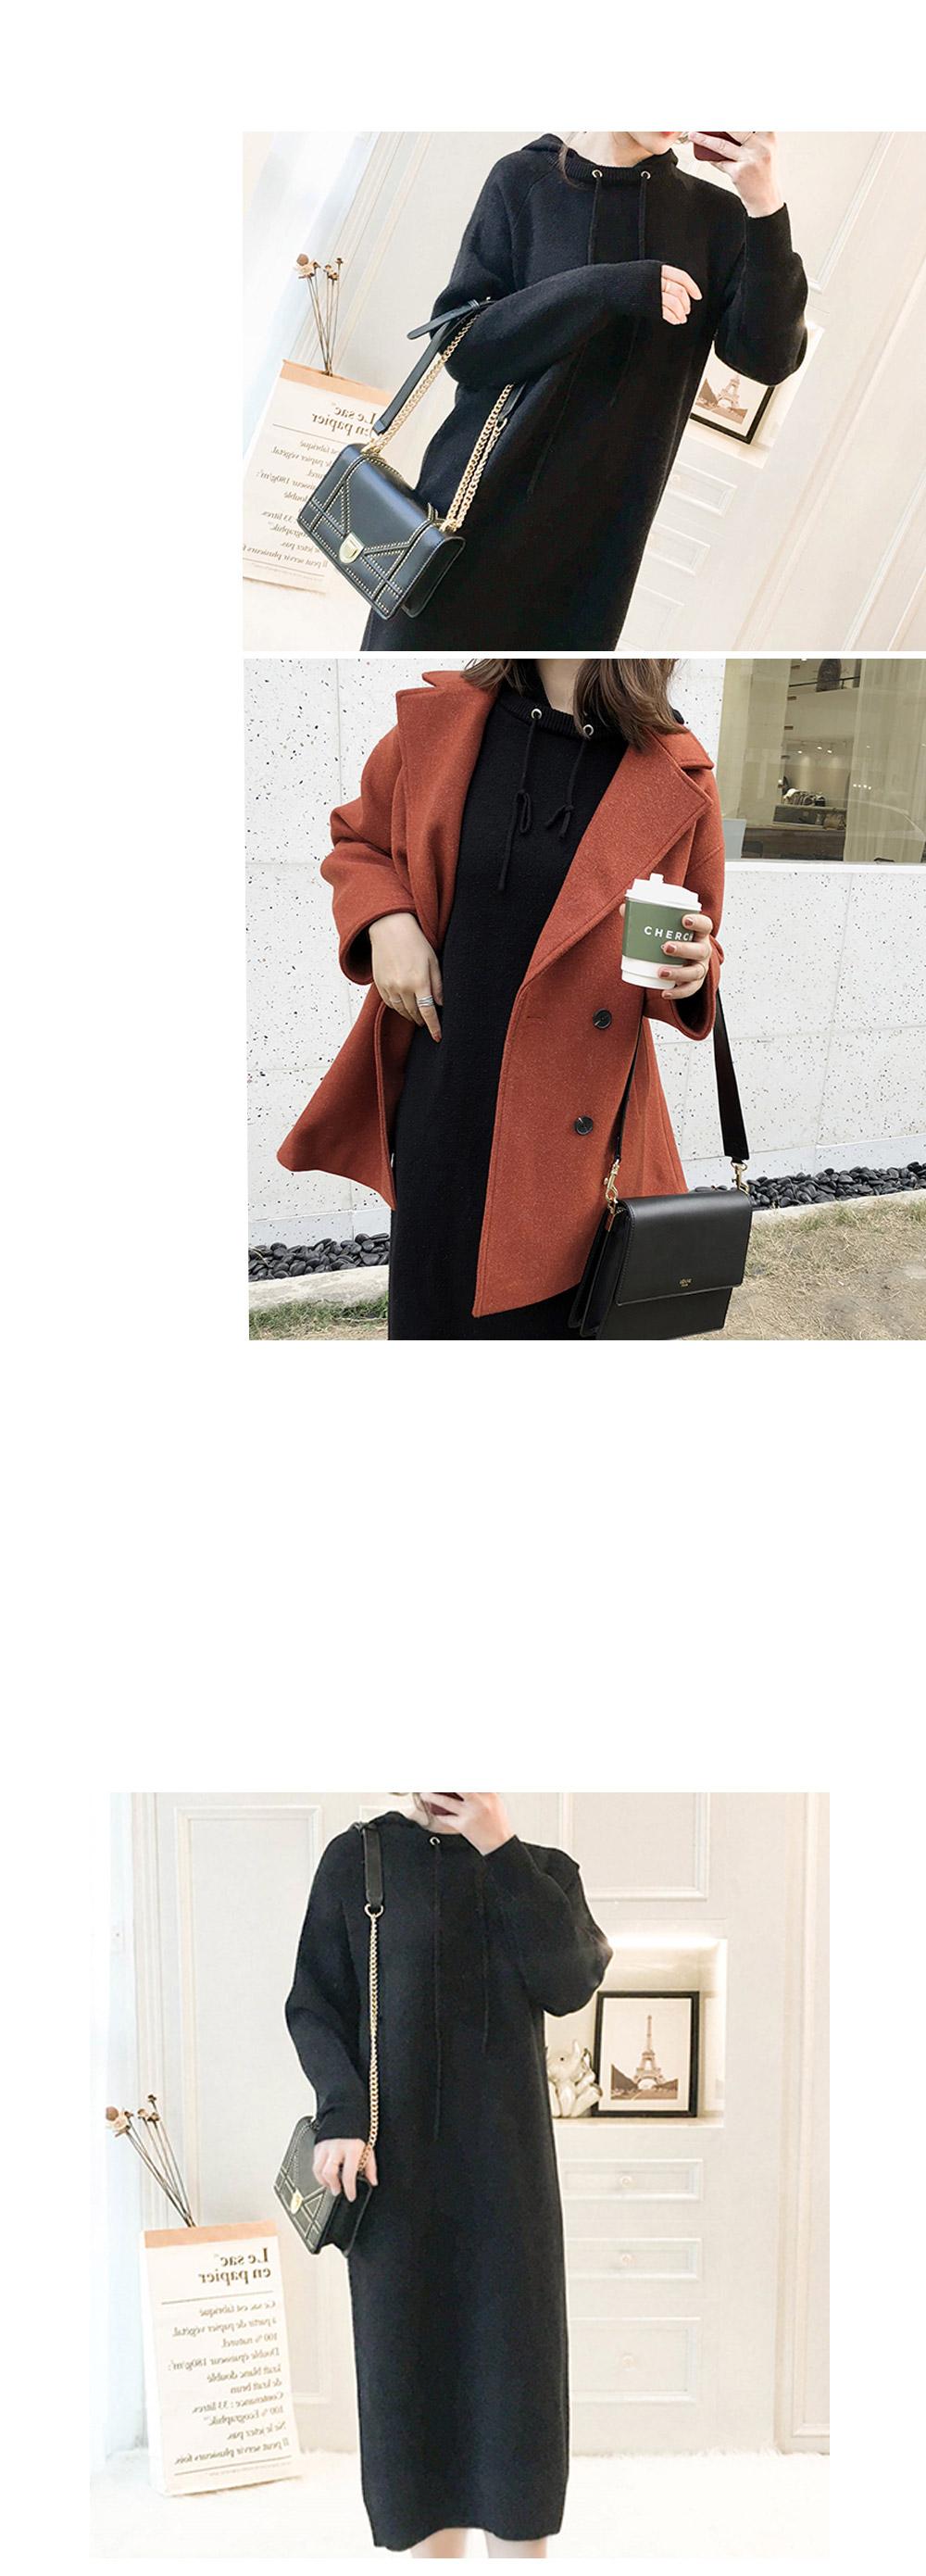 Moringbee Hooded Knit Dress